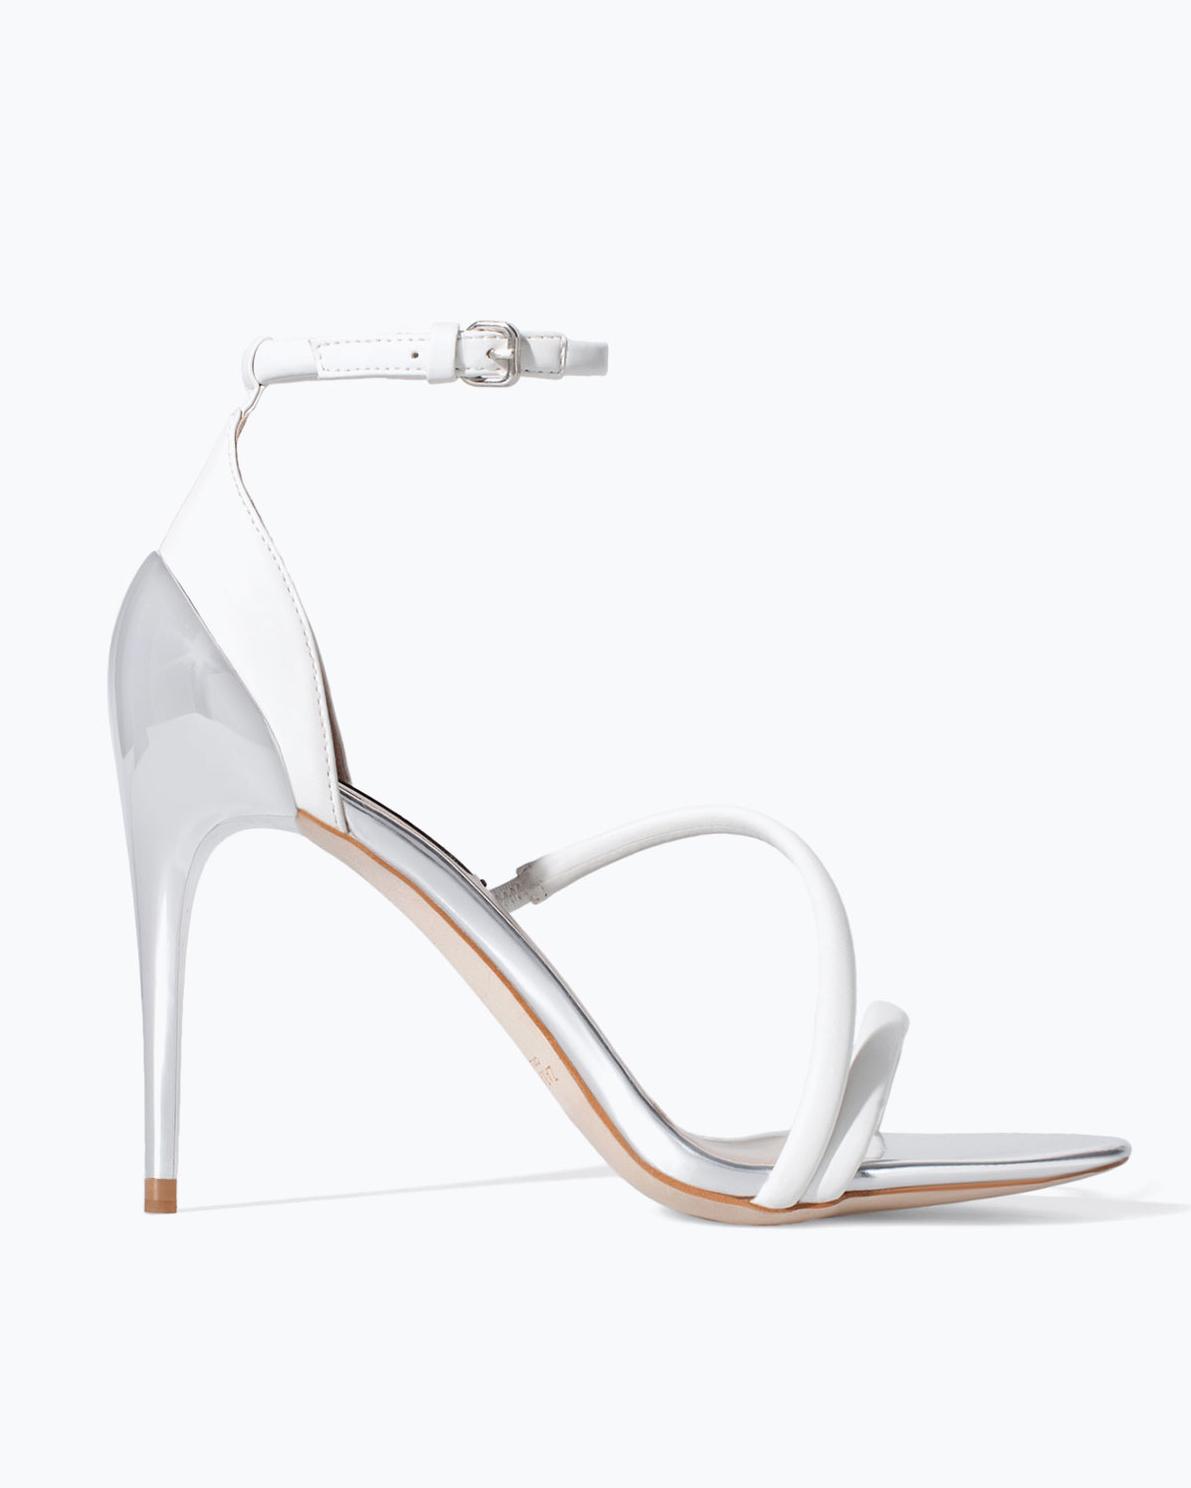 fall-wedding-shoes-zara-sandal-0914.jpg